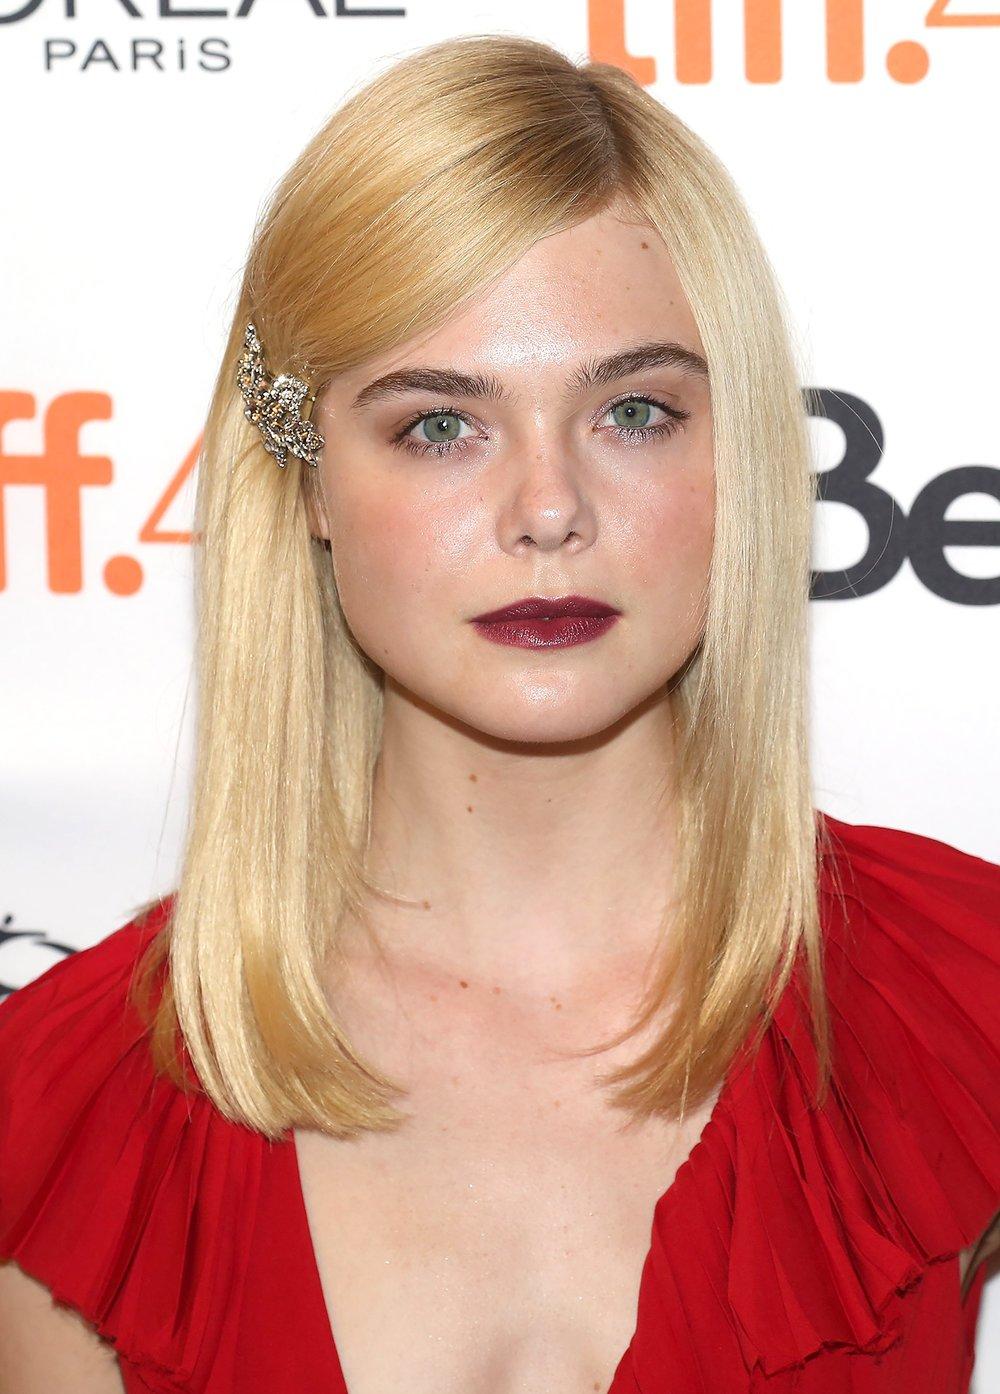 side-how-to-style-hair-accessories-clip-barrettes-wear-blonde-ellefanning.jpg